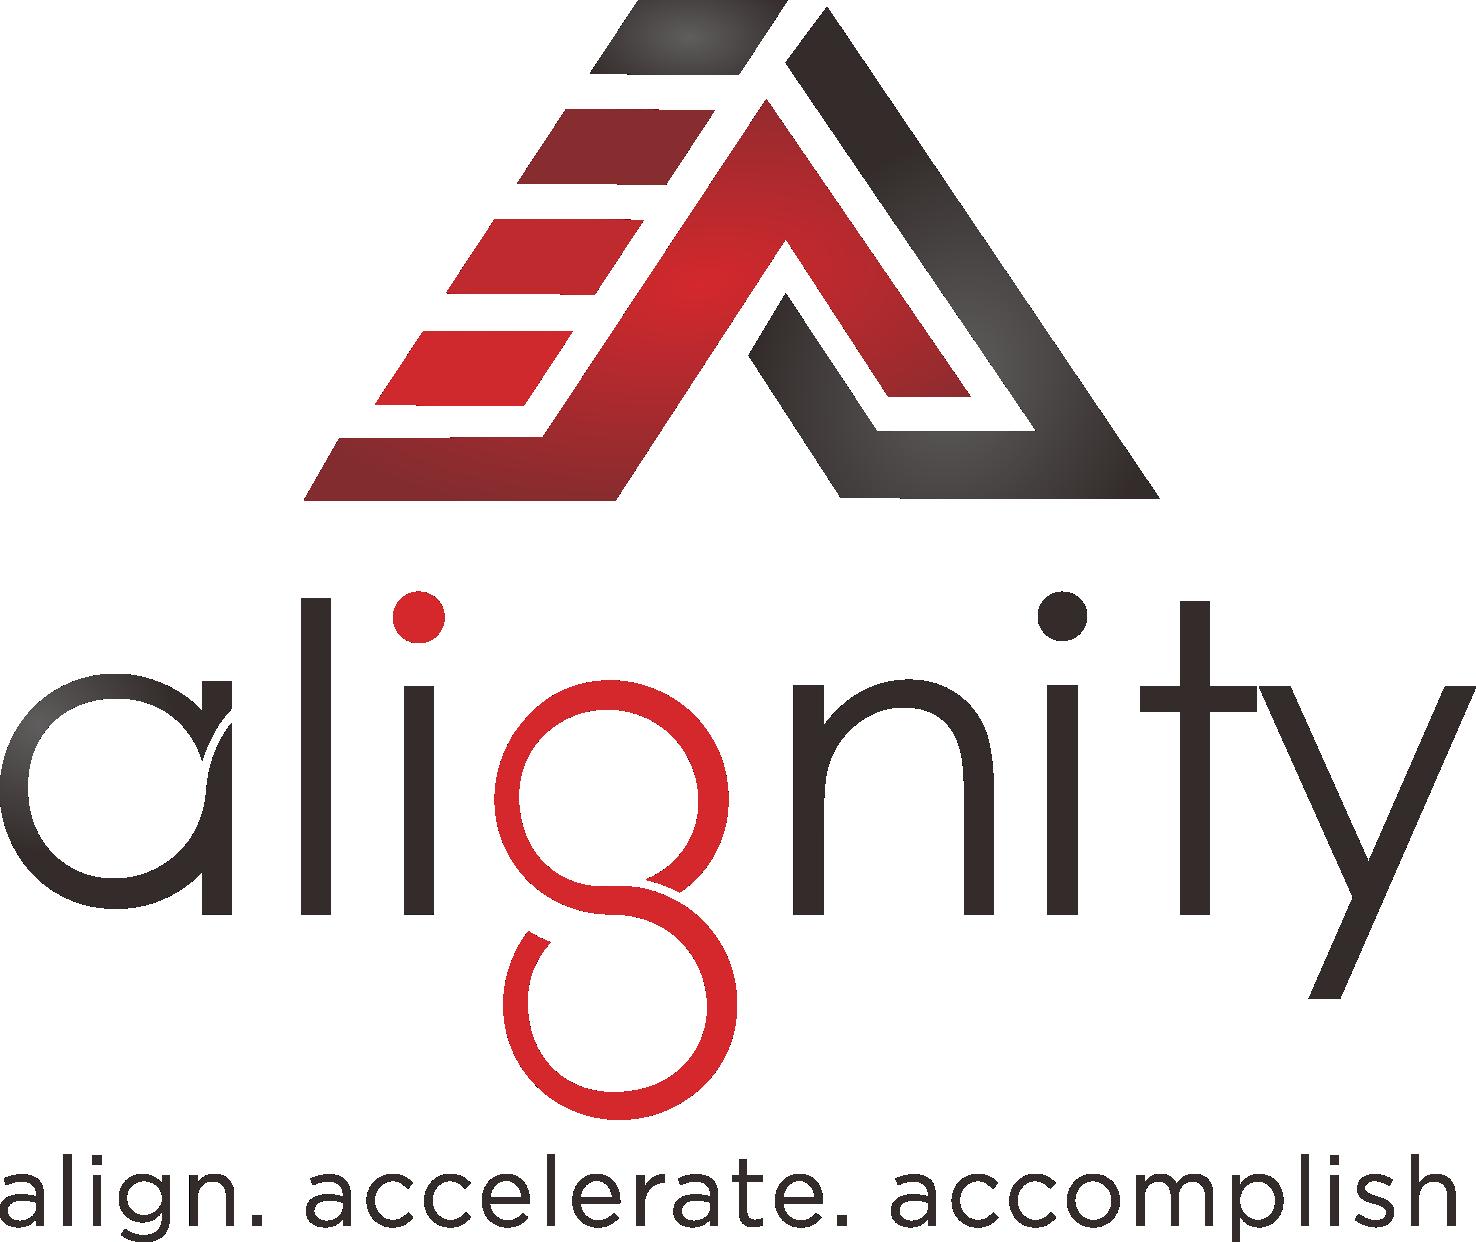 Tech company Logo to rebrand & scale up